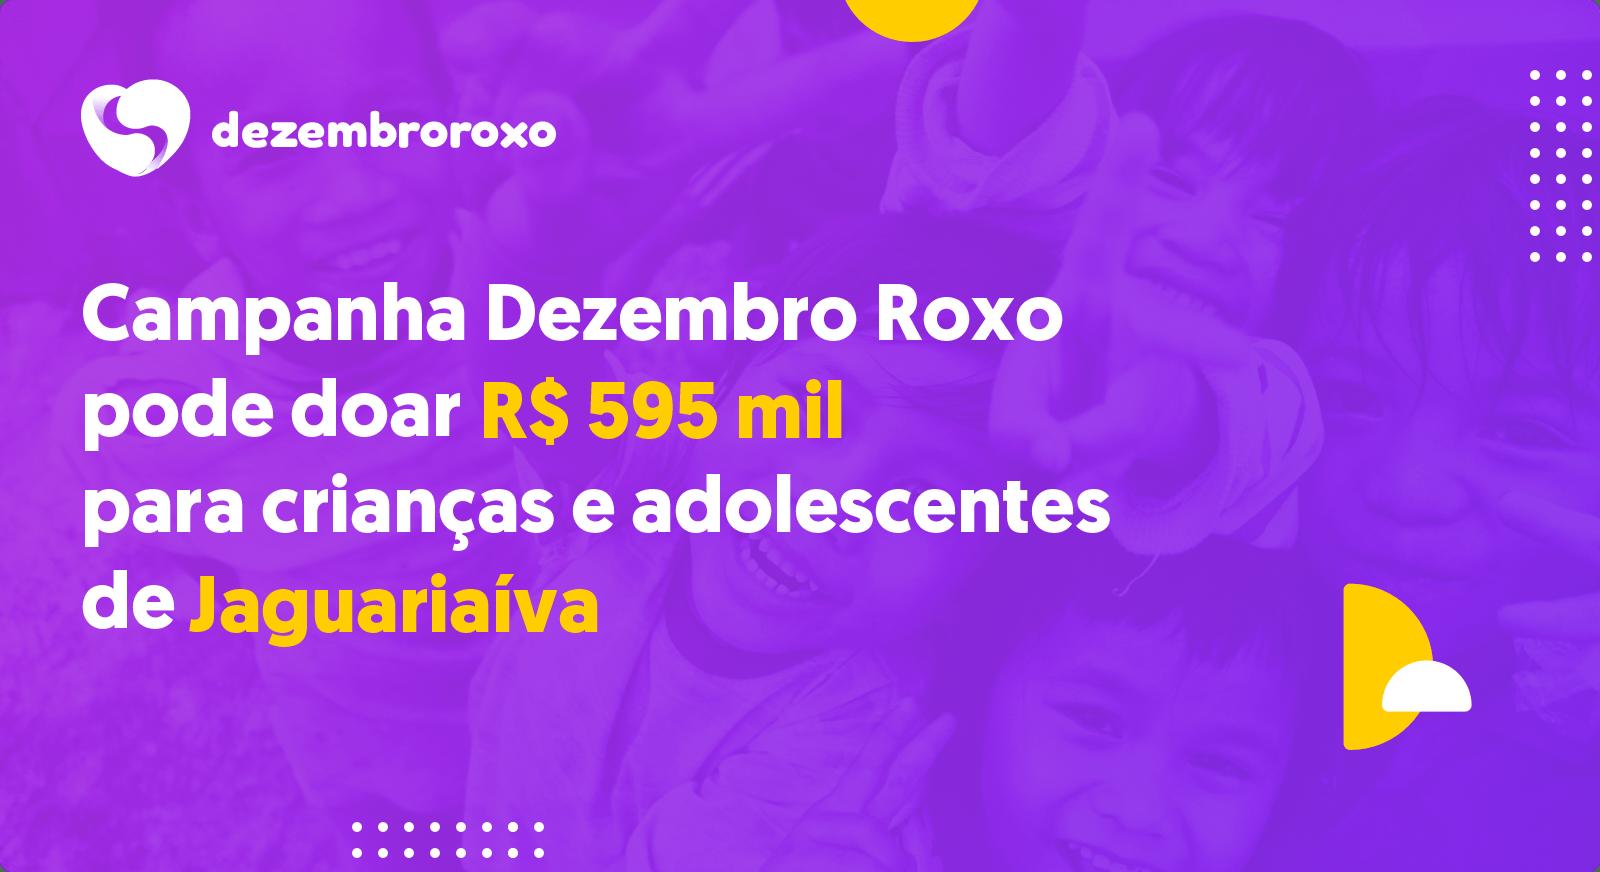 Doações em Jaguariaíva - PR